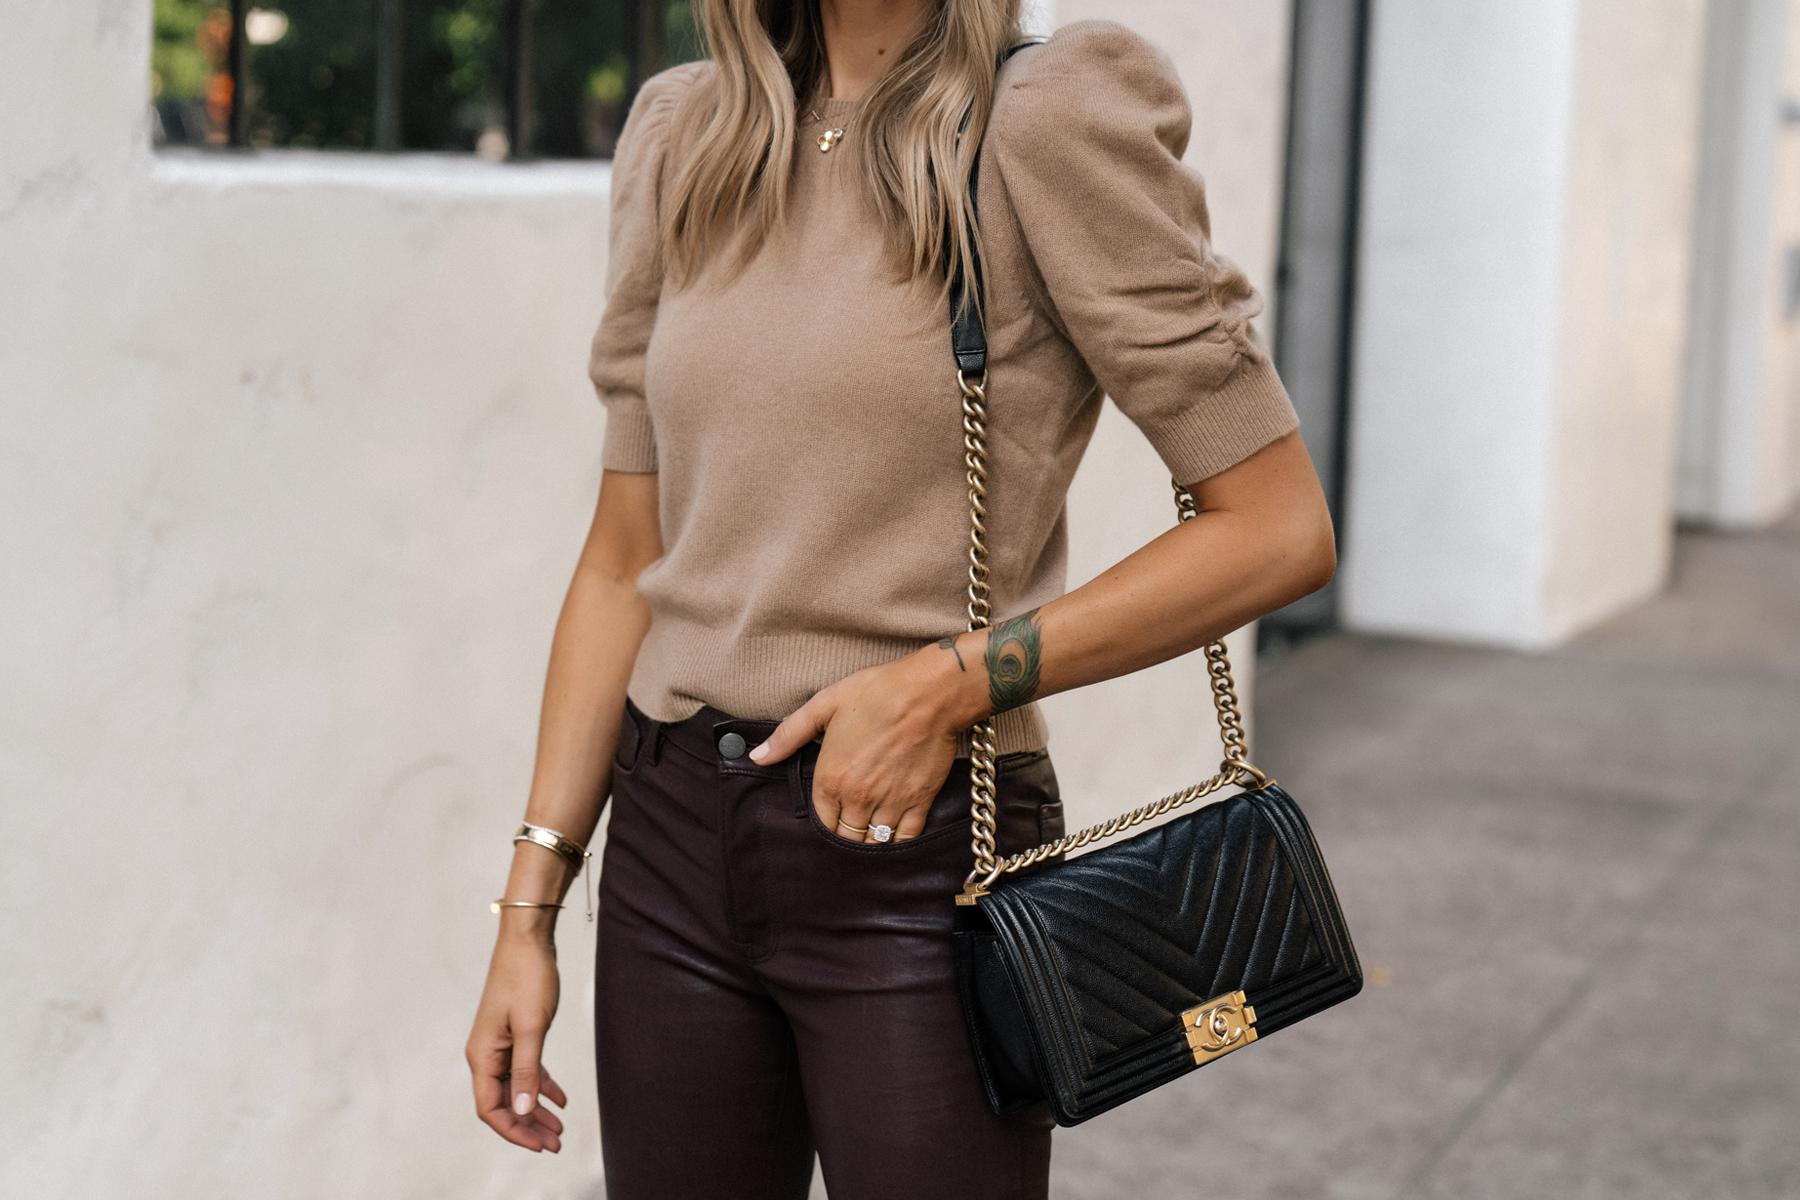 Fashion Jackson Wearing Frame Tan Short Sleeve Puff Sleeve Sweater Chanel Black Boy Bag Burgundy Leather Pants